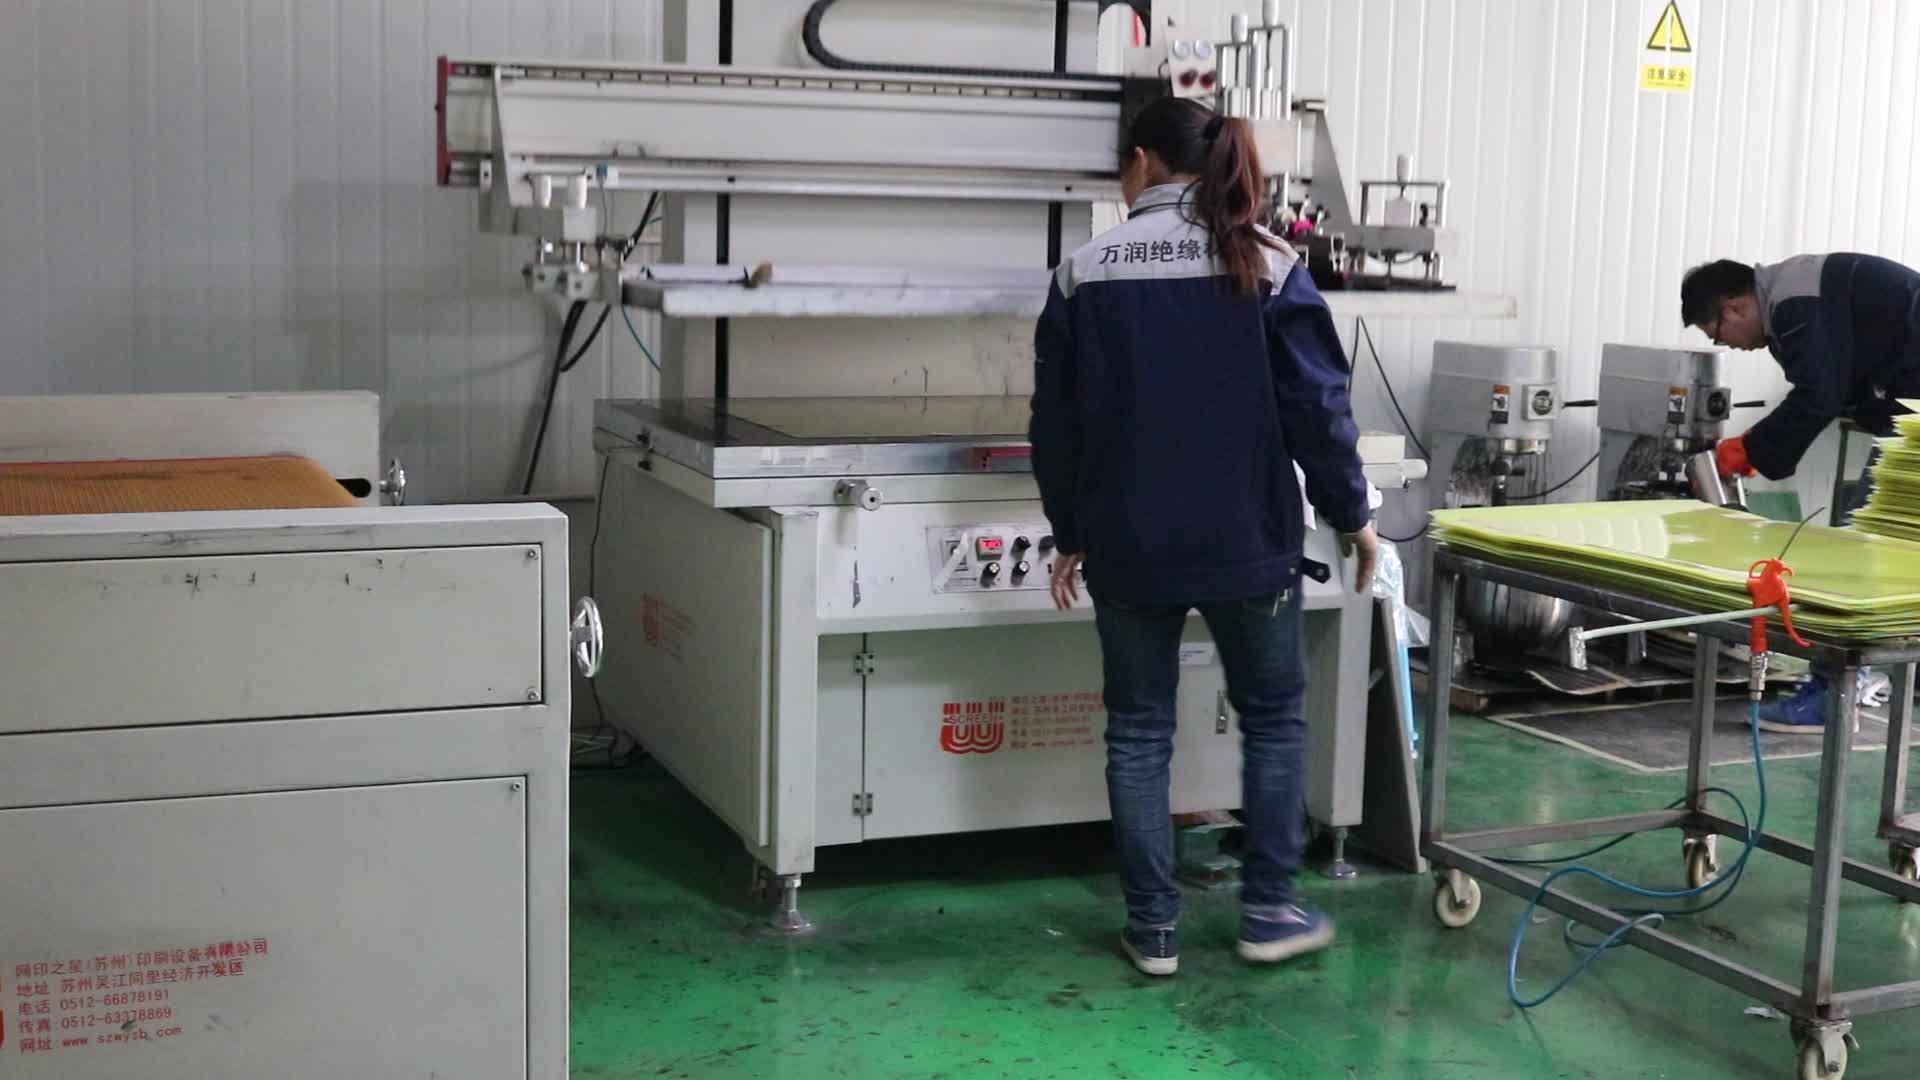 Günstigen fabrik Preis 0,2mm 0,4mm 0,6mm dicke wärme-beständig epoxy harz bord